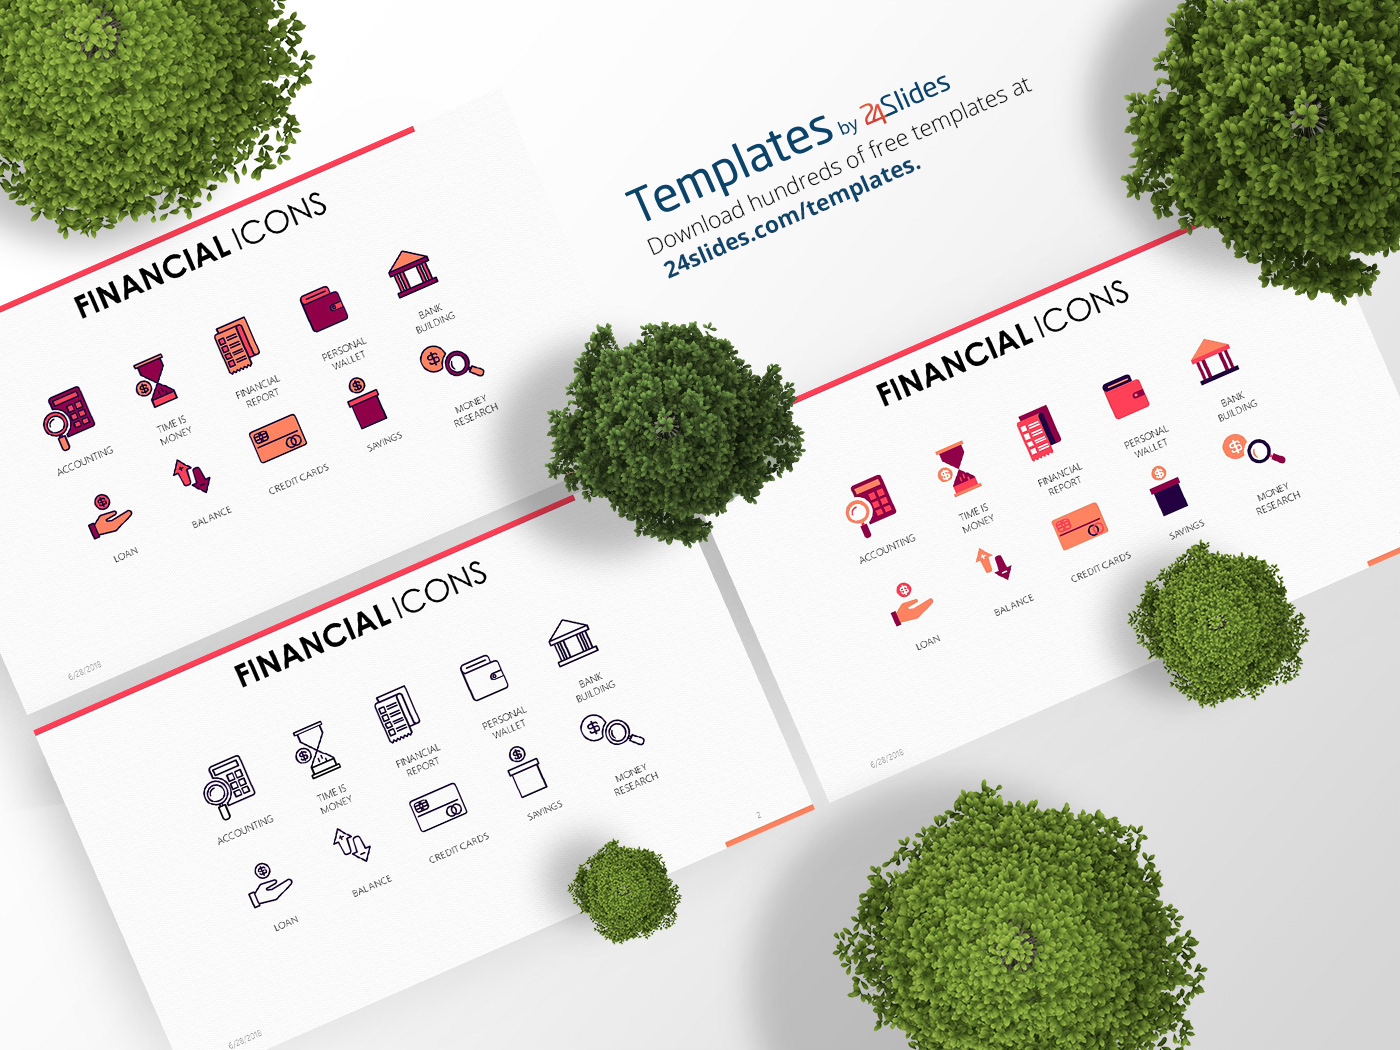 presenting modern corporateidentity graphicdesign free Keynote 24Slides PresentationLayout branding  templates